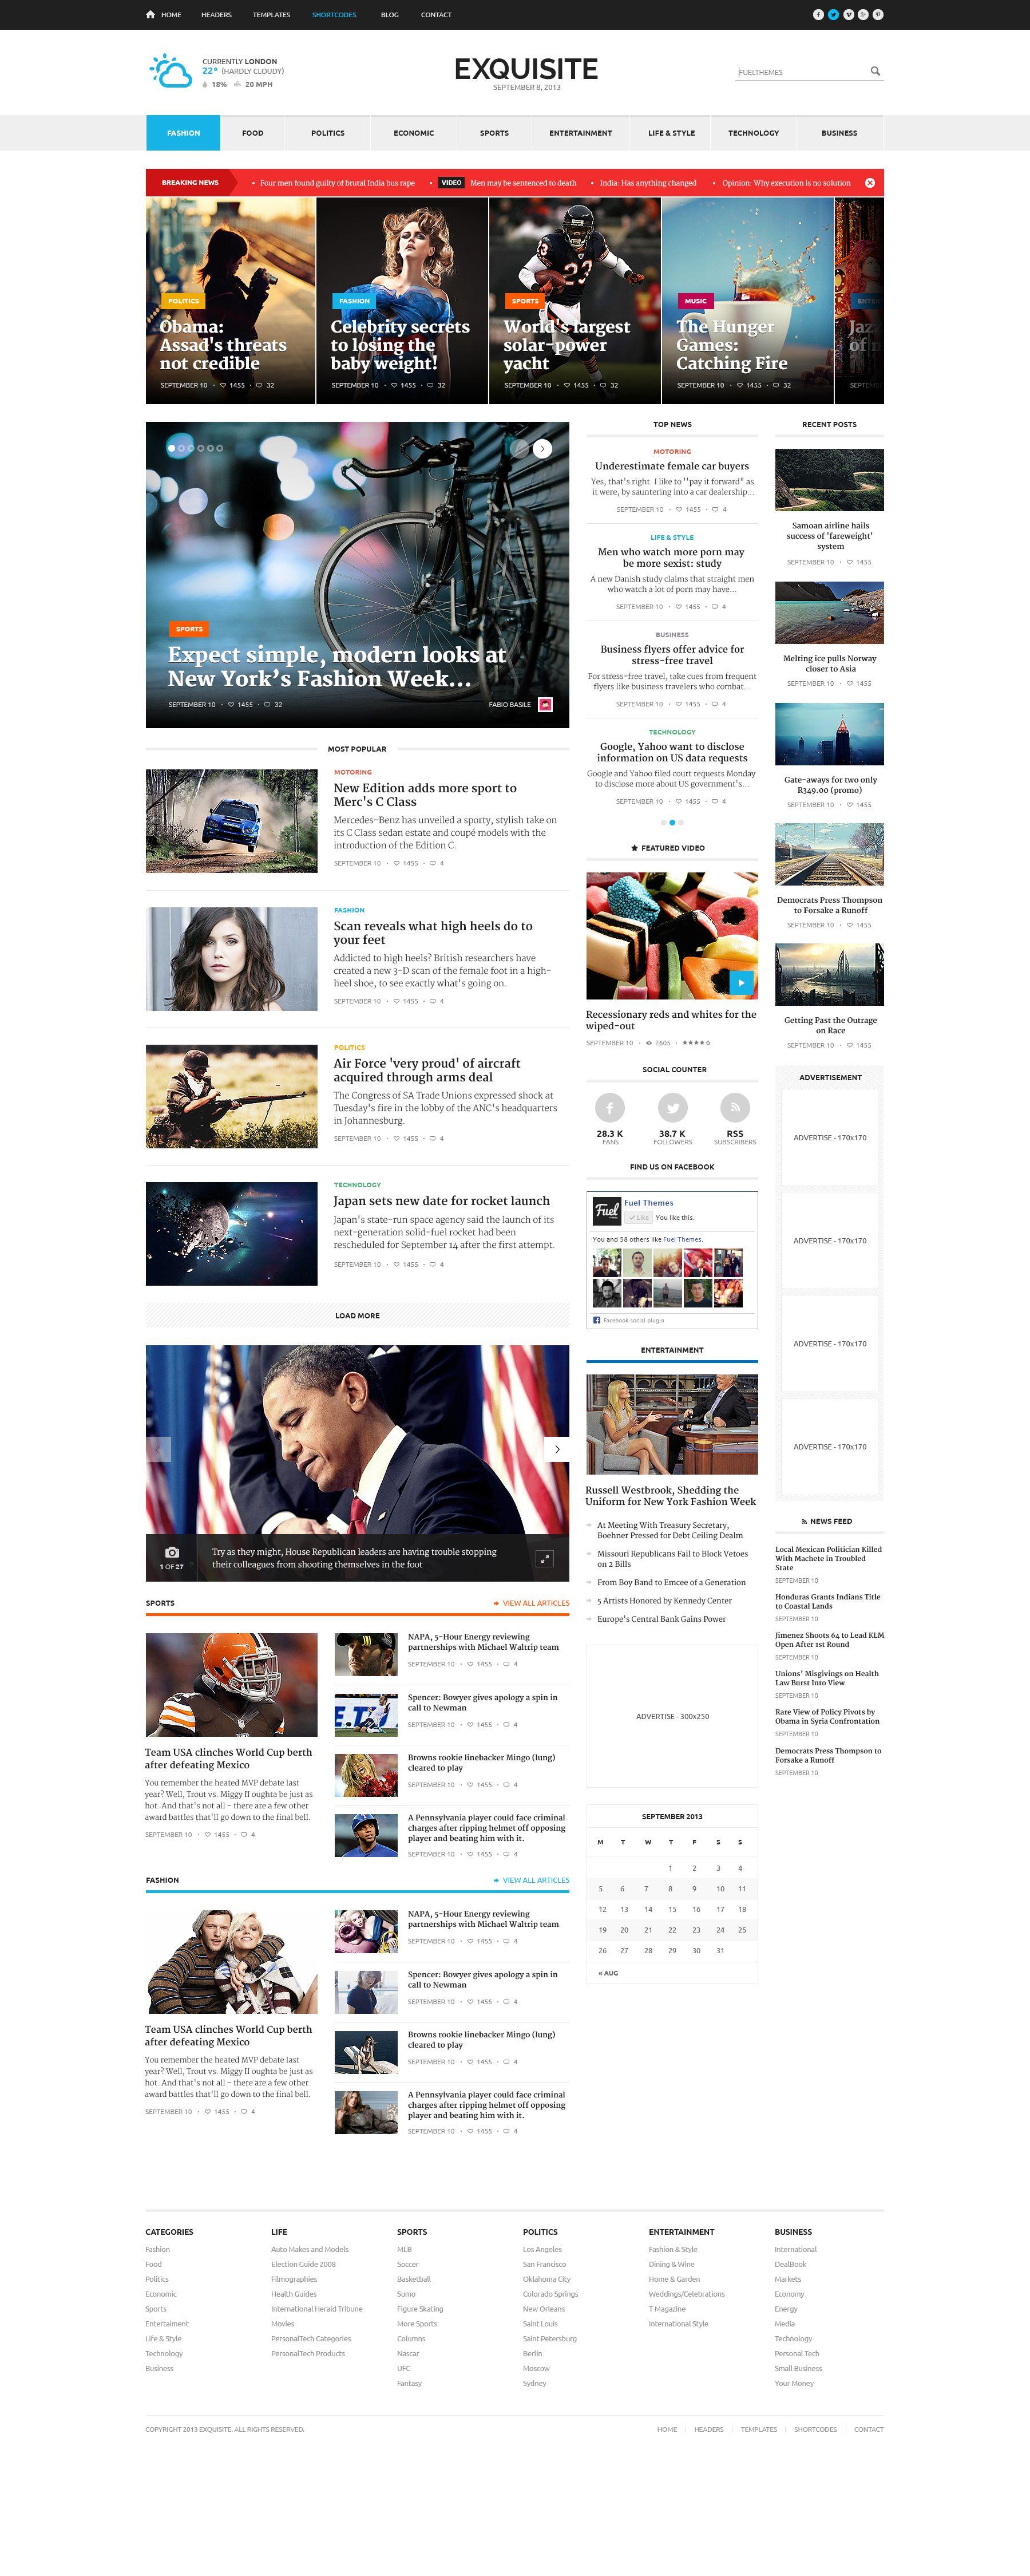 Dribbble Exquisite Home Jpg By Aykut Yilmaz News Web Design Newspaper Design Layout News Website Design